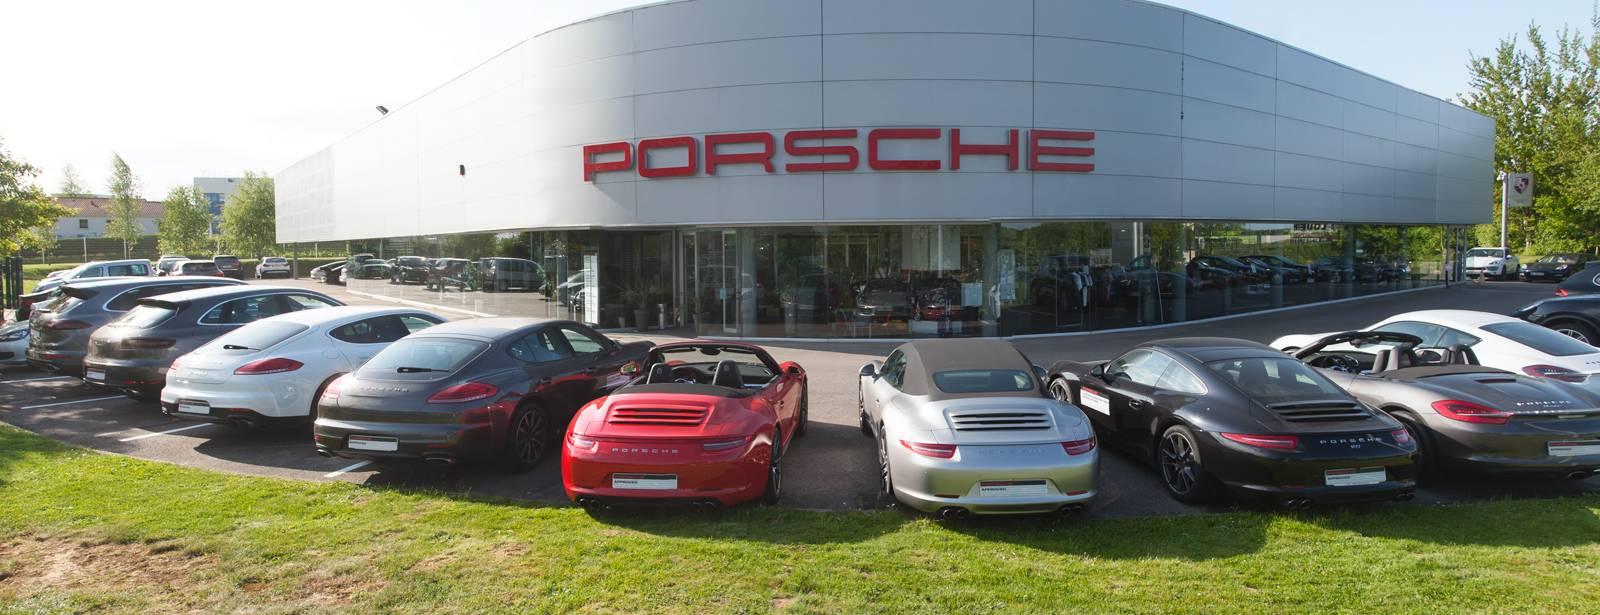 Porsche Caen